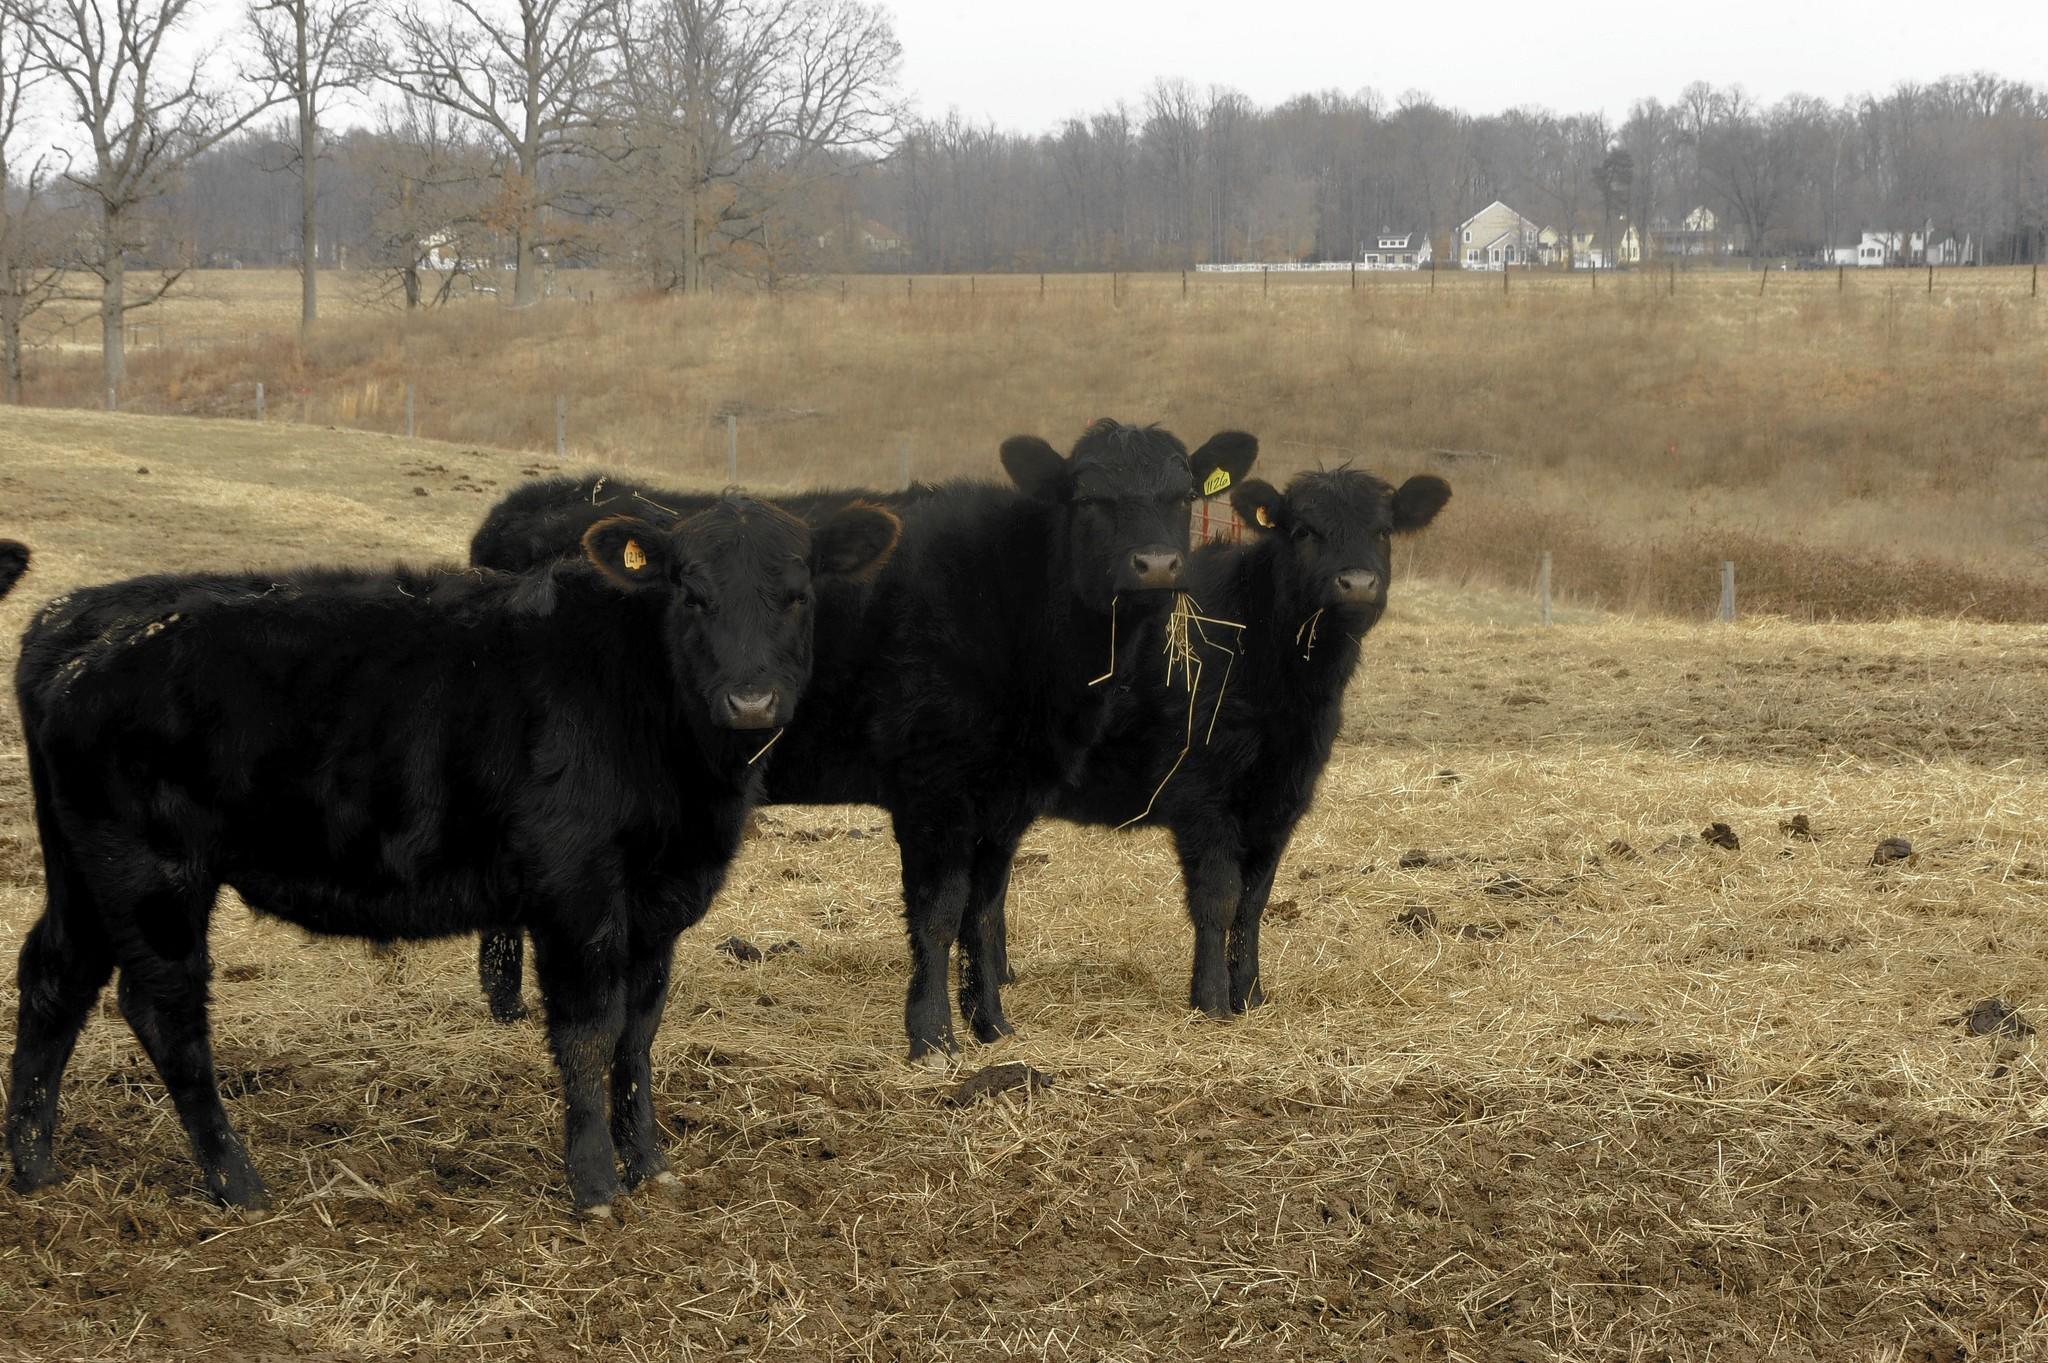 Spring calves roam the Maryland Sunrise Farm, the site of the former Naval Academy Dairy Farm.